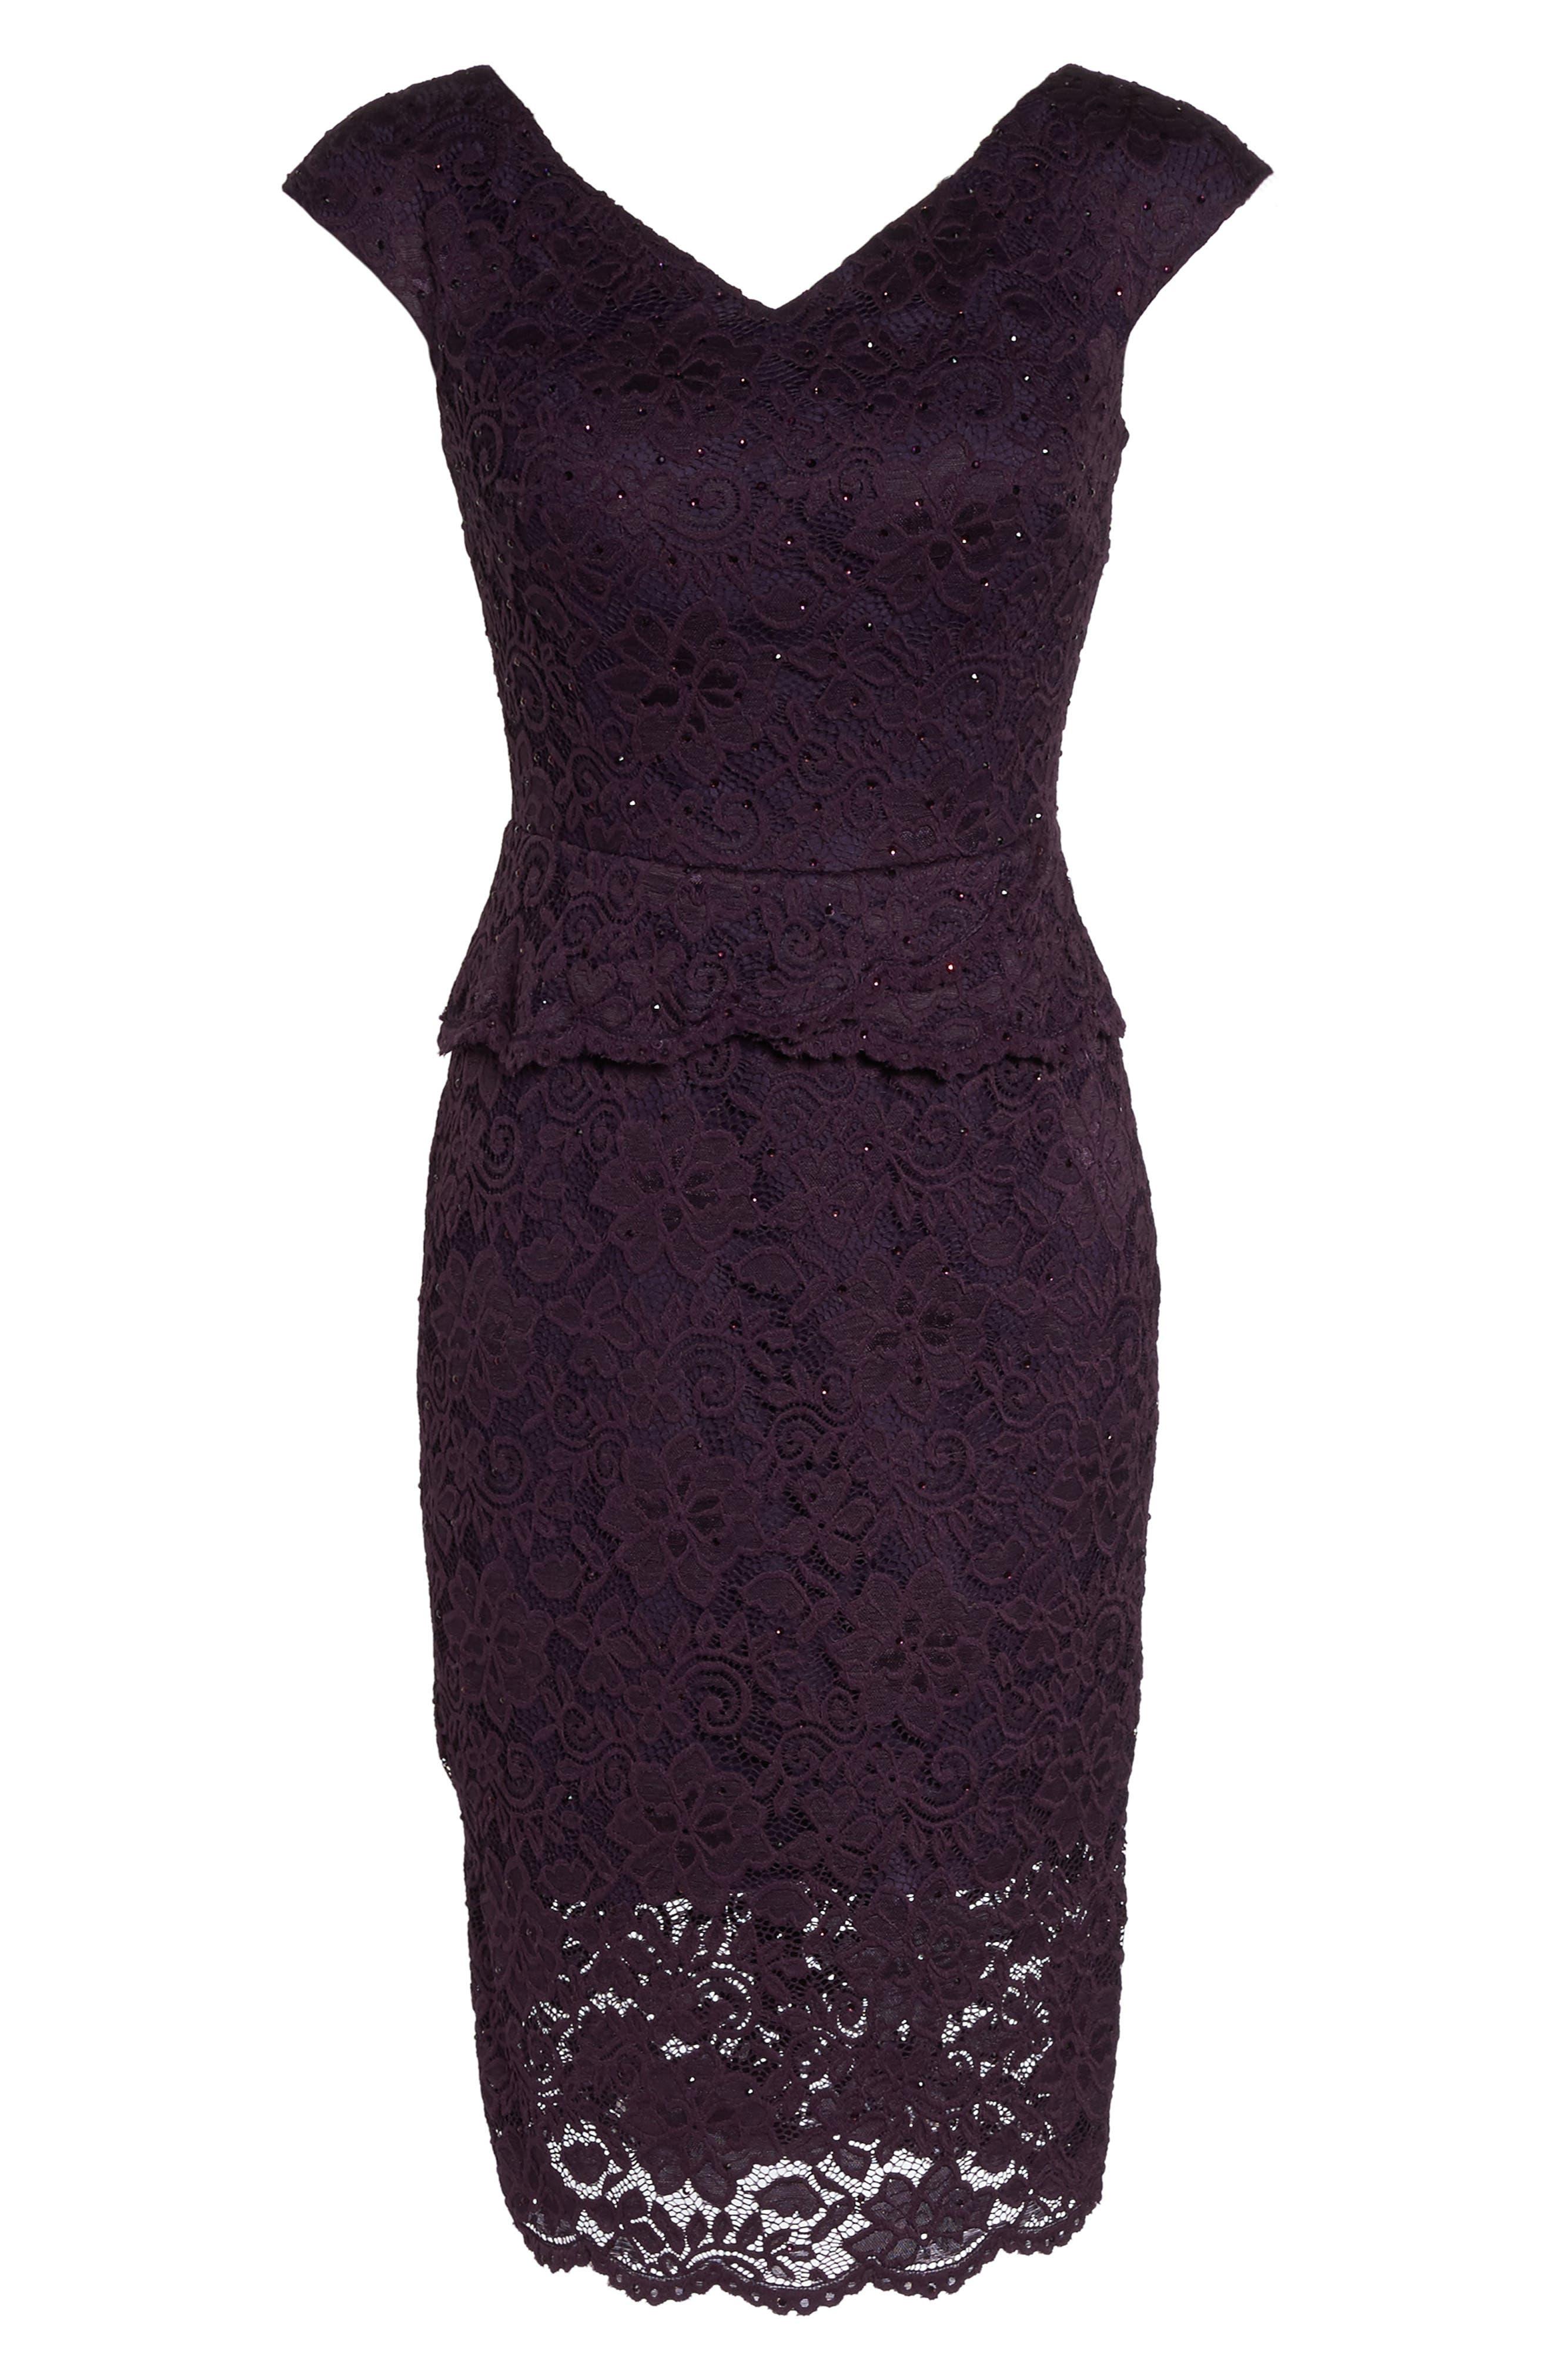 LA FEMME, Embellished Lace Sheath Dress, Alternate thumbnail 6, color, 501